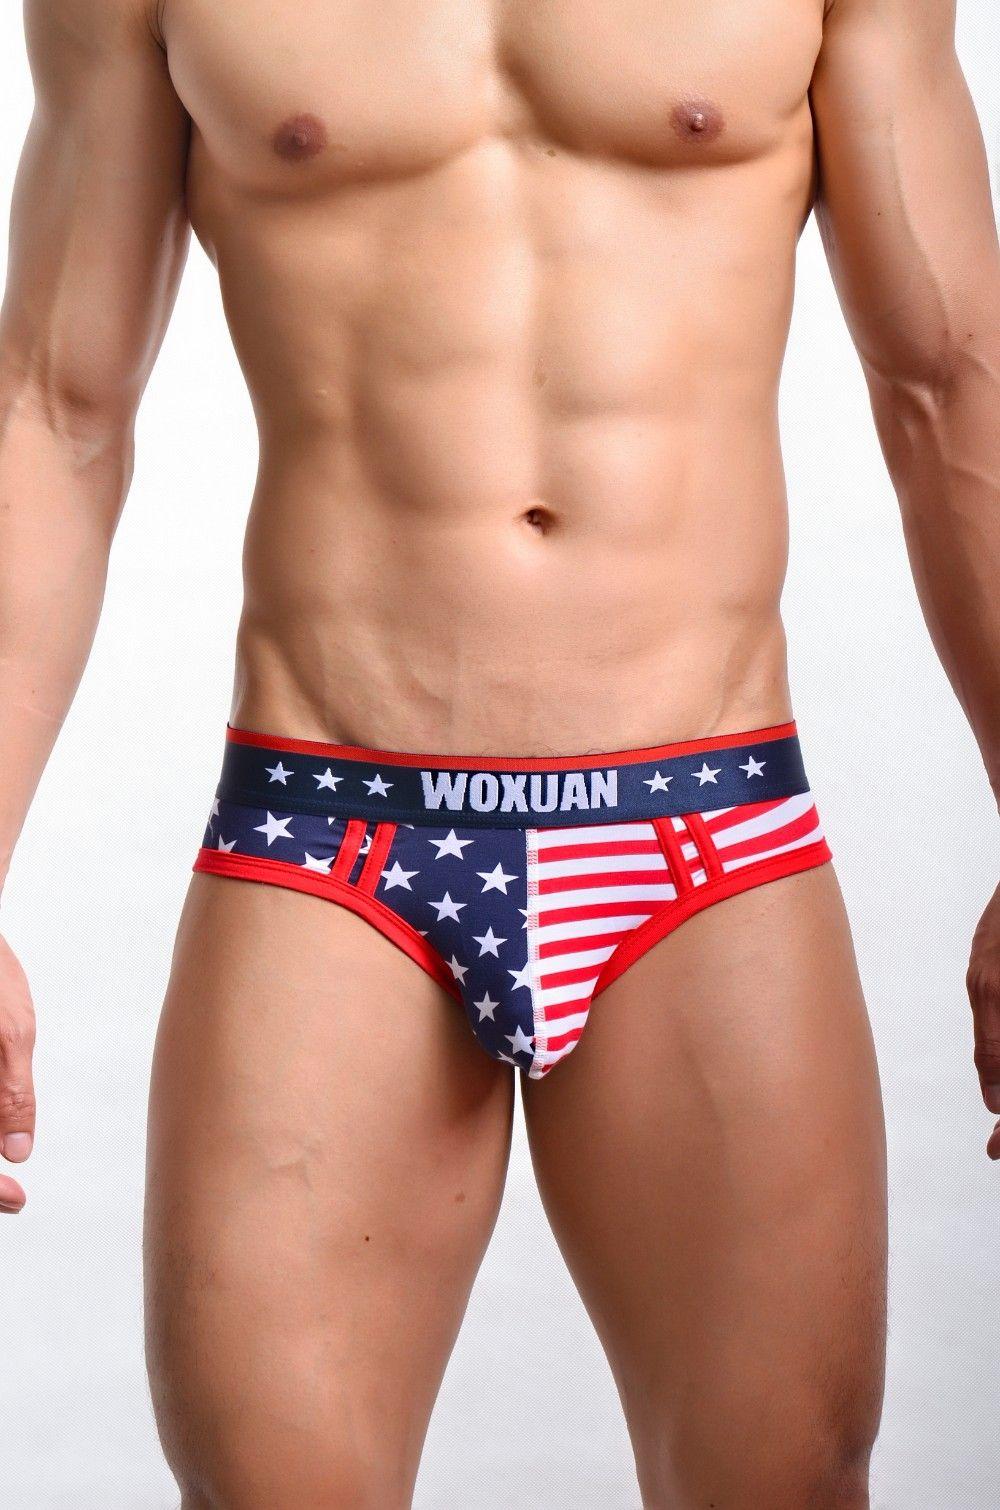 Sexy mens underwear pics